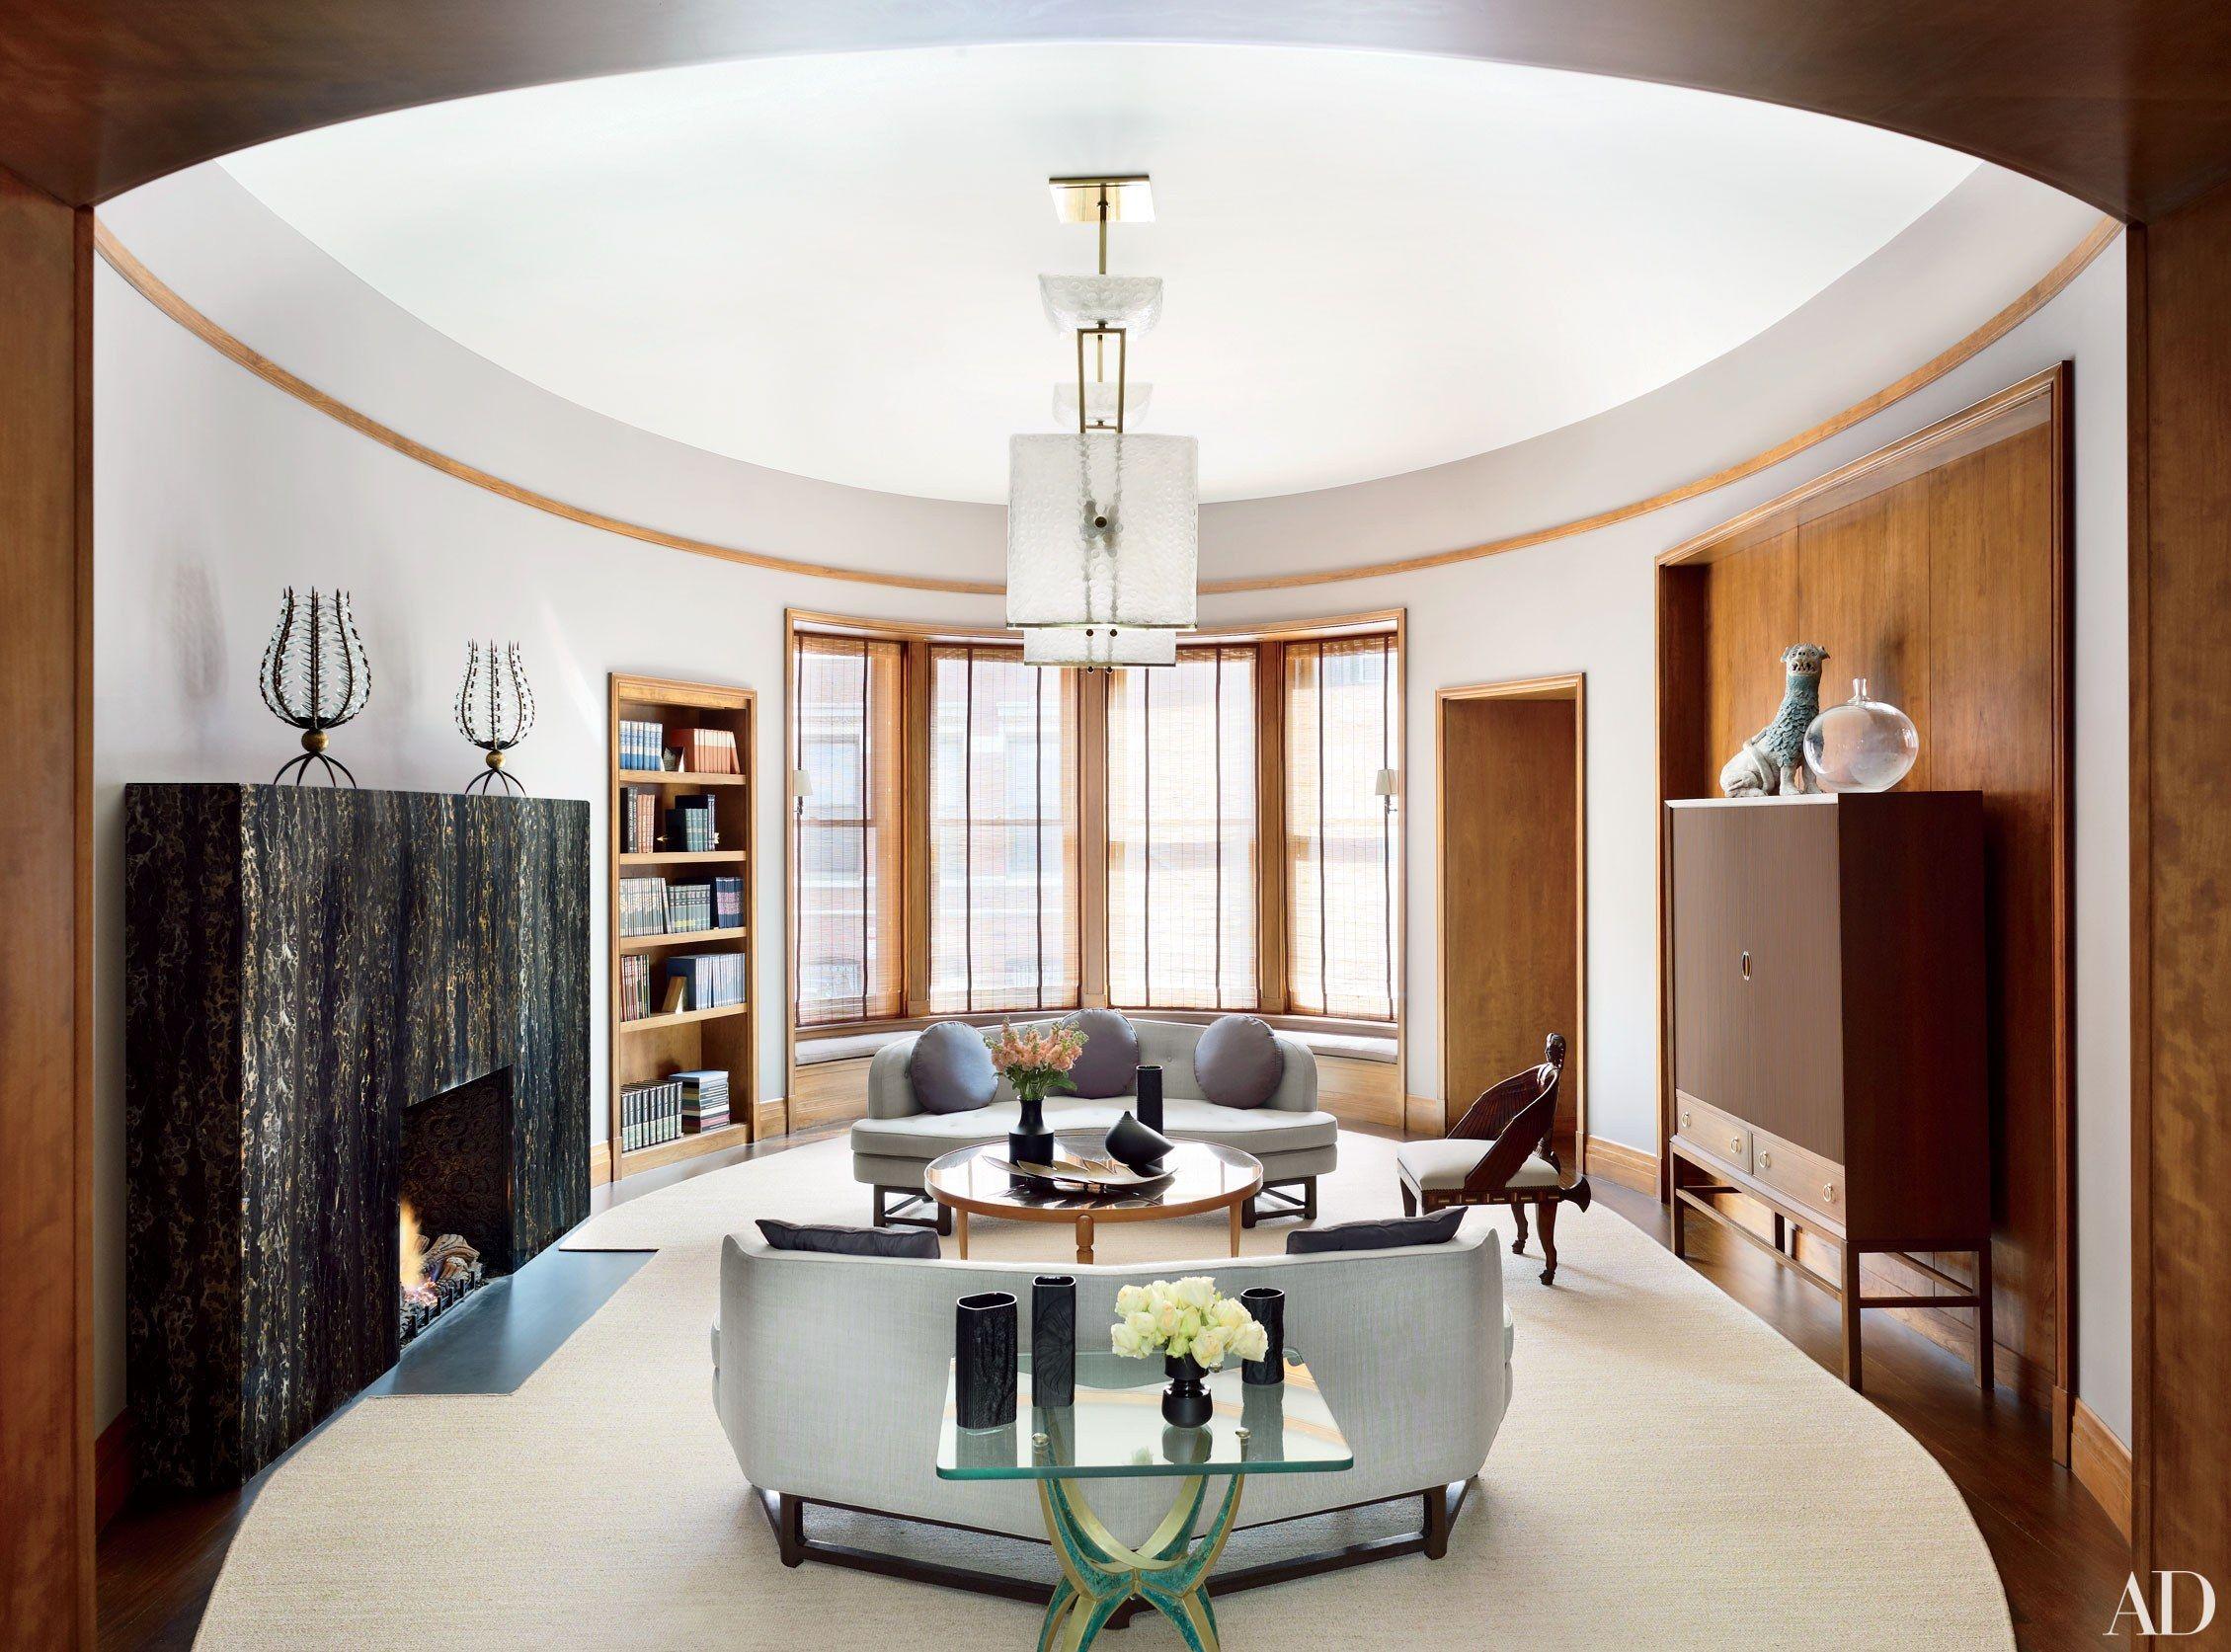 Home Decor Ideas - Modern Design Photos | Architectural Digest